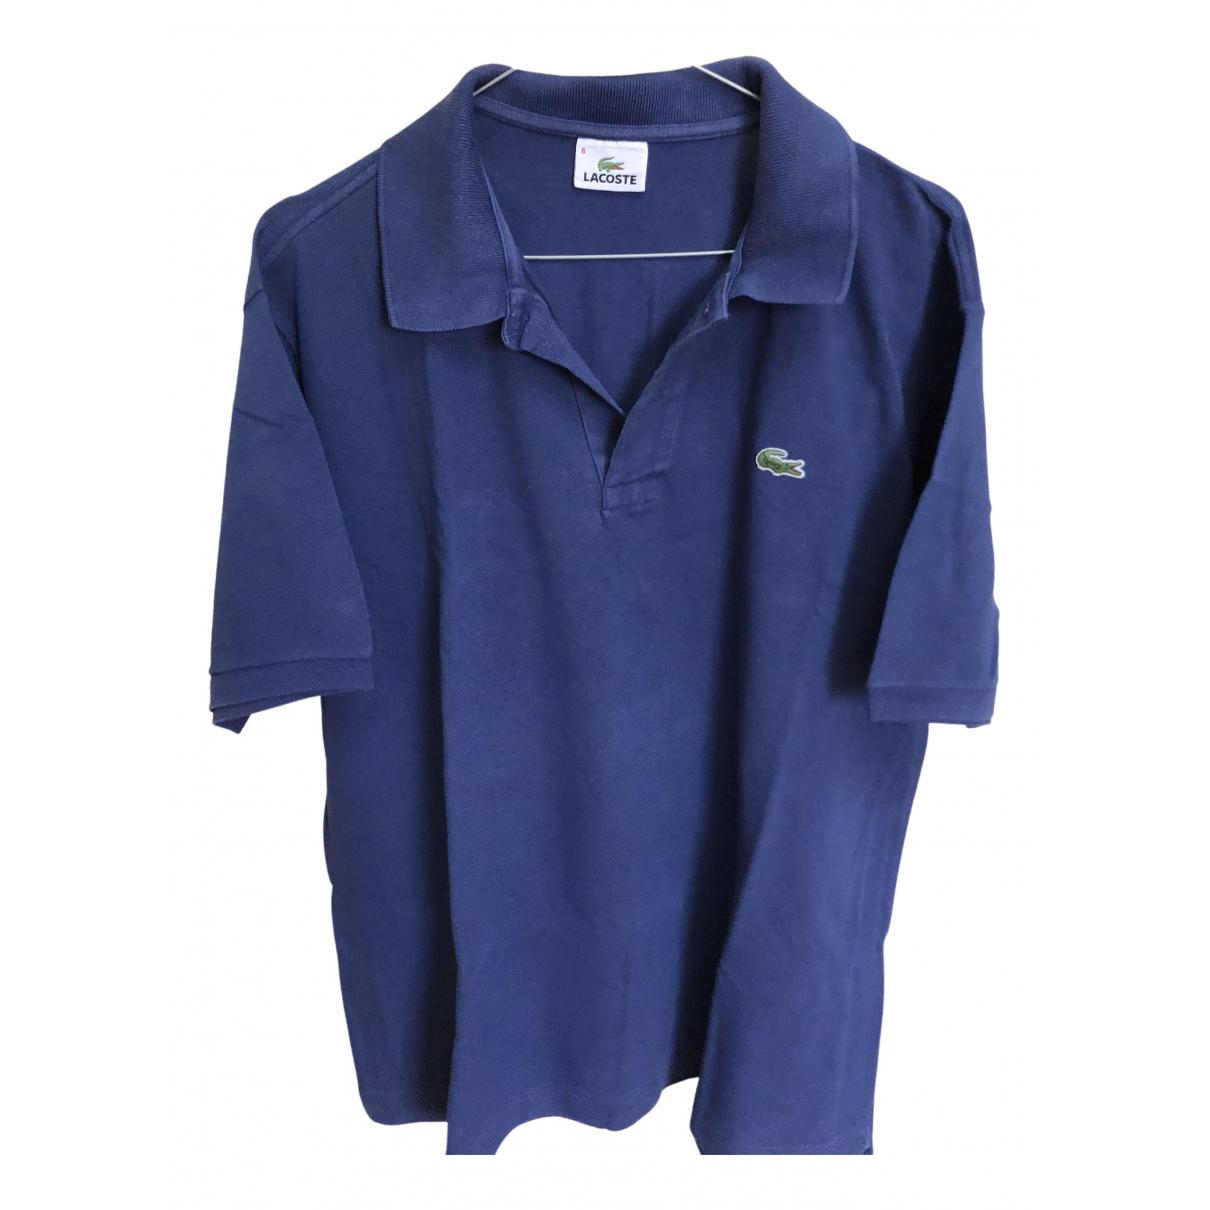 Lacoste N Blue Cotton Polo shirts for Men XXL International